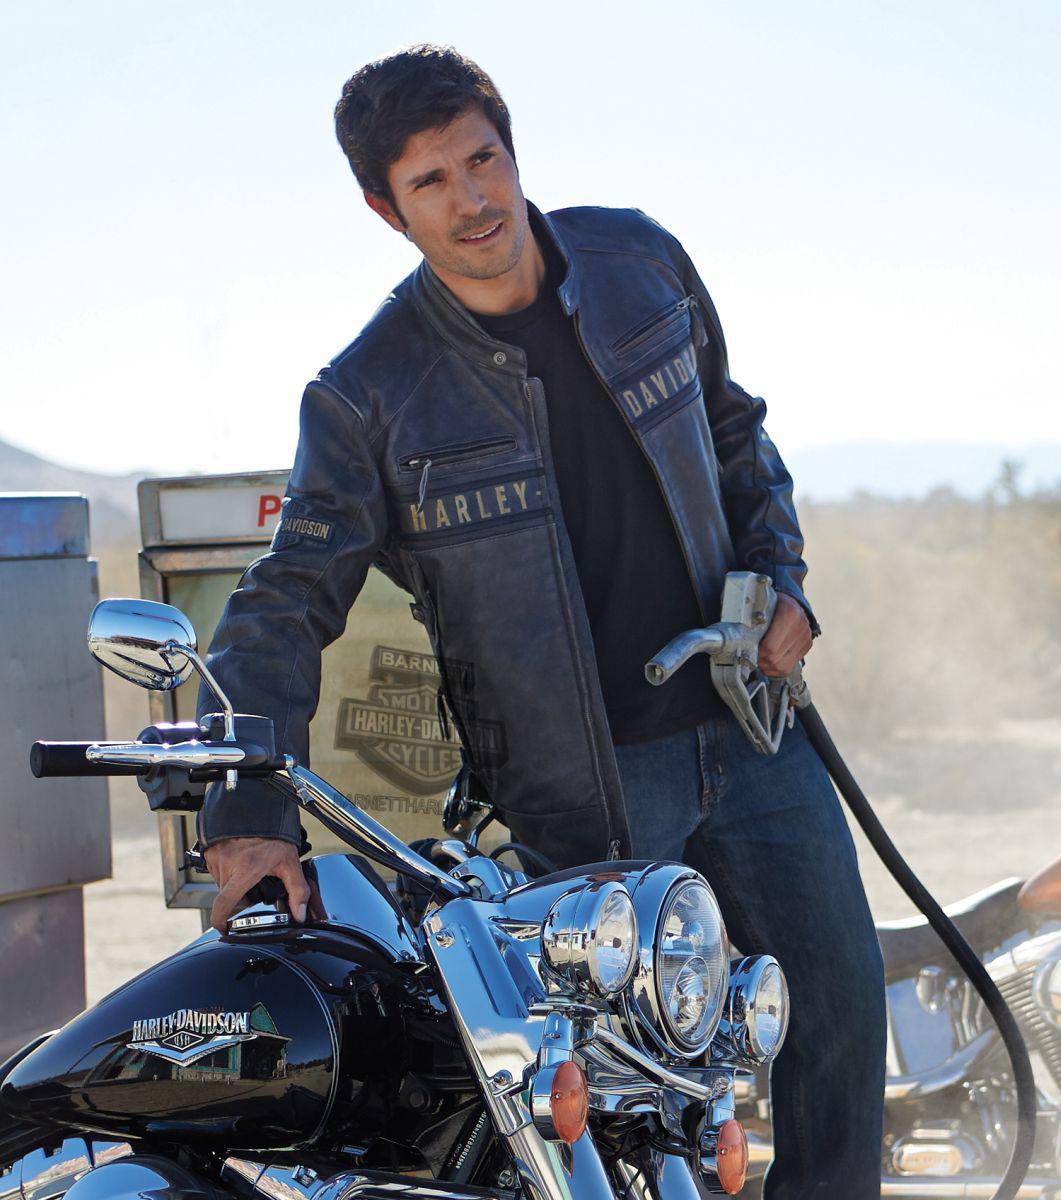 Used Harley Davidson Mens Leather Jackets